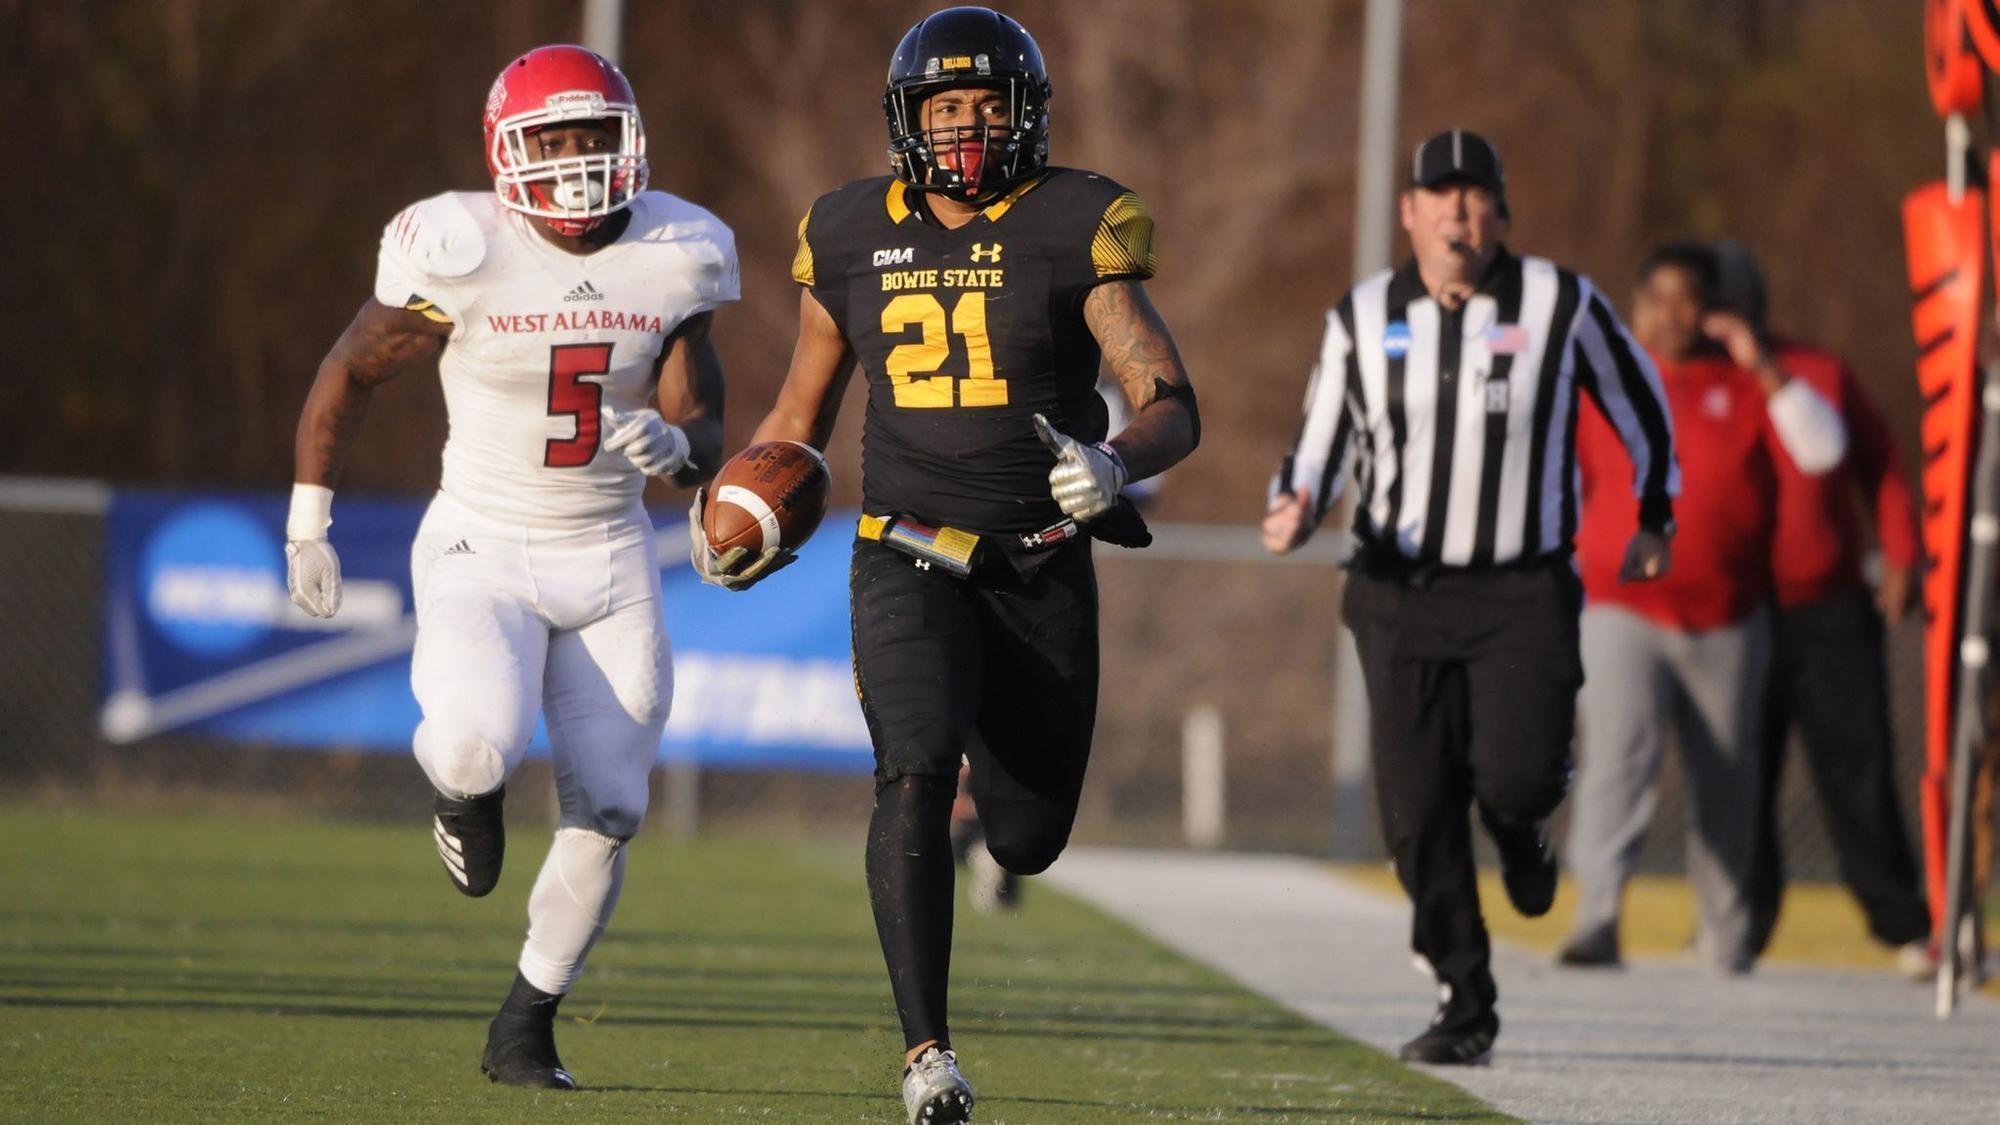 Bowie State advances in NCAA playoffs